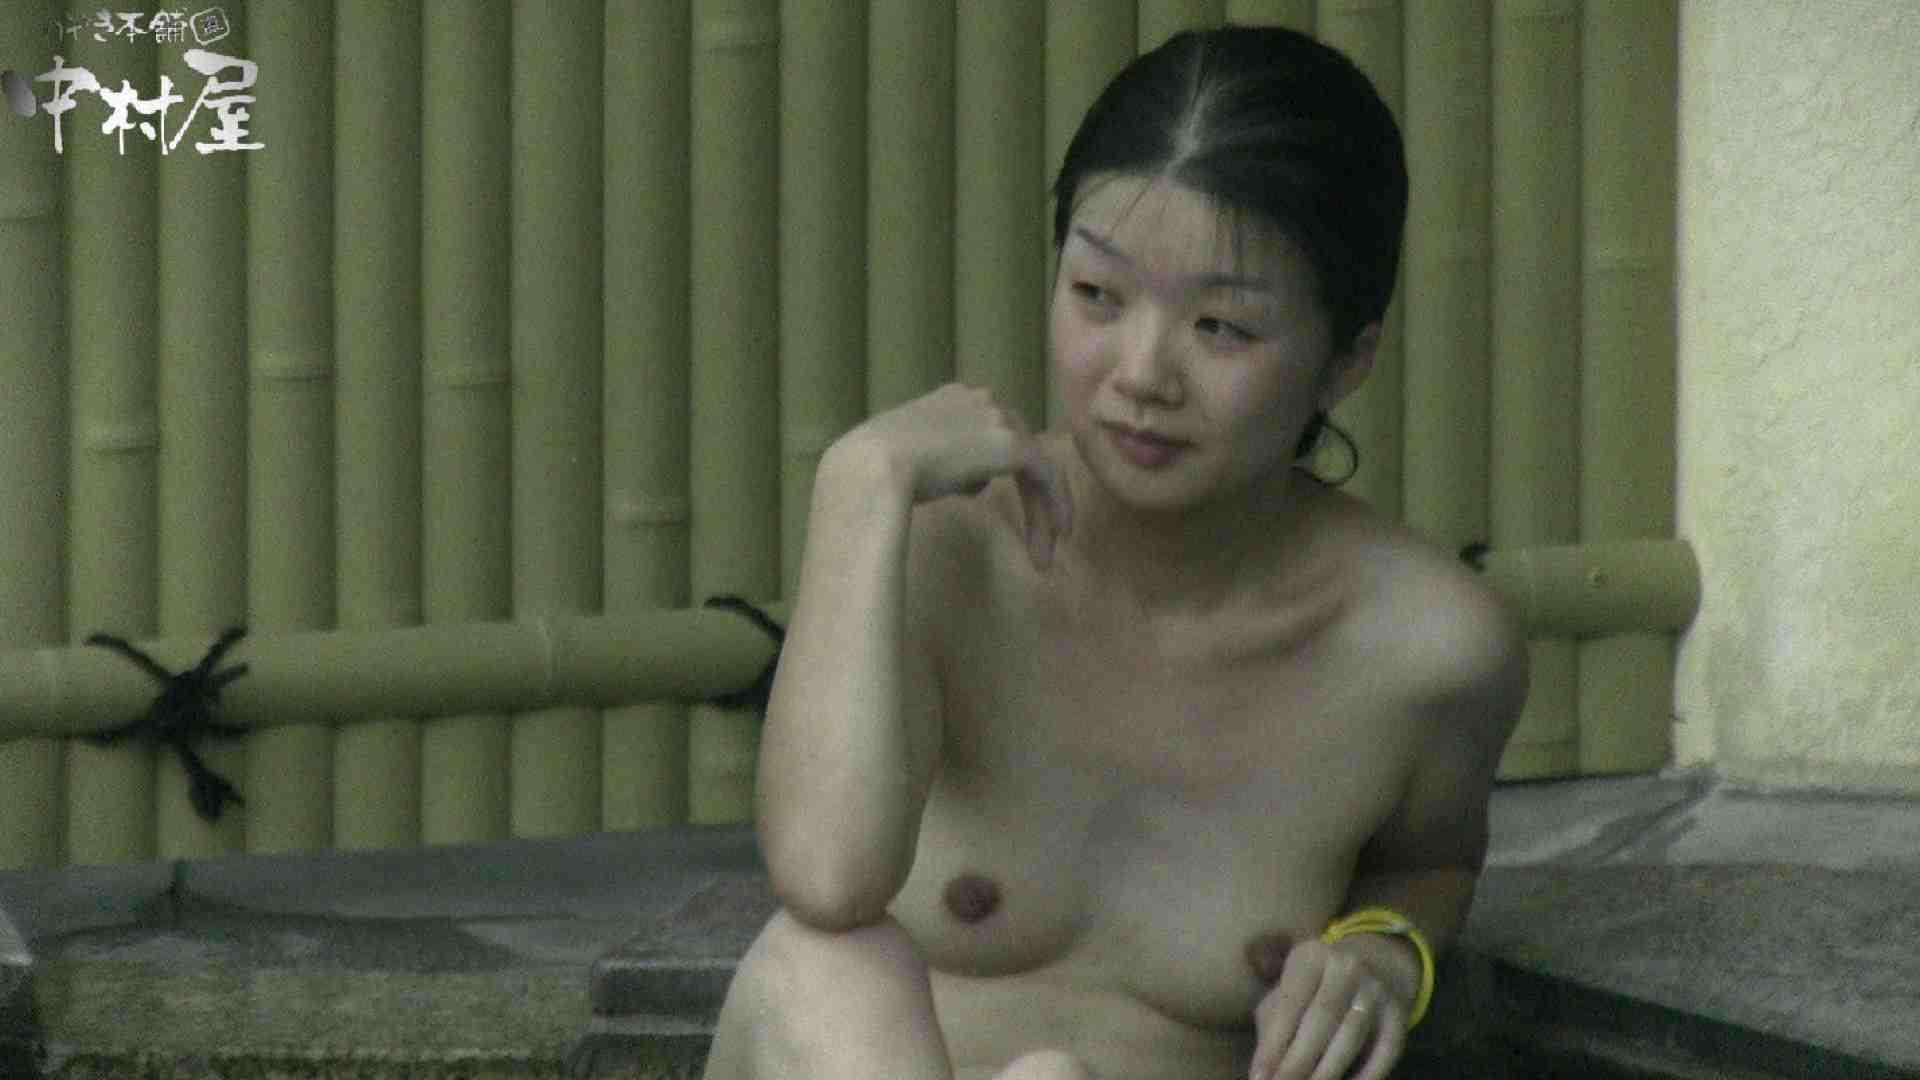 Aquaな露天風呂Vol.904 美しいOLの裸体 オメコ動画キャプチャ 103pic 20